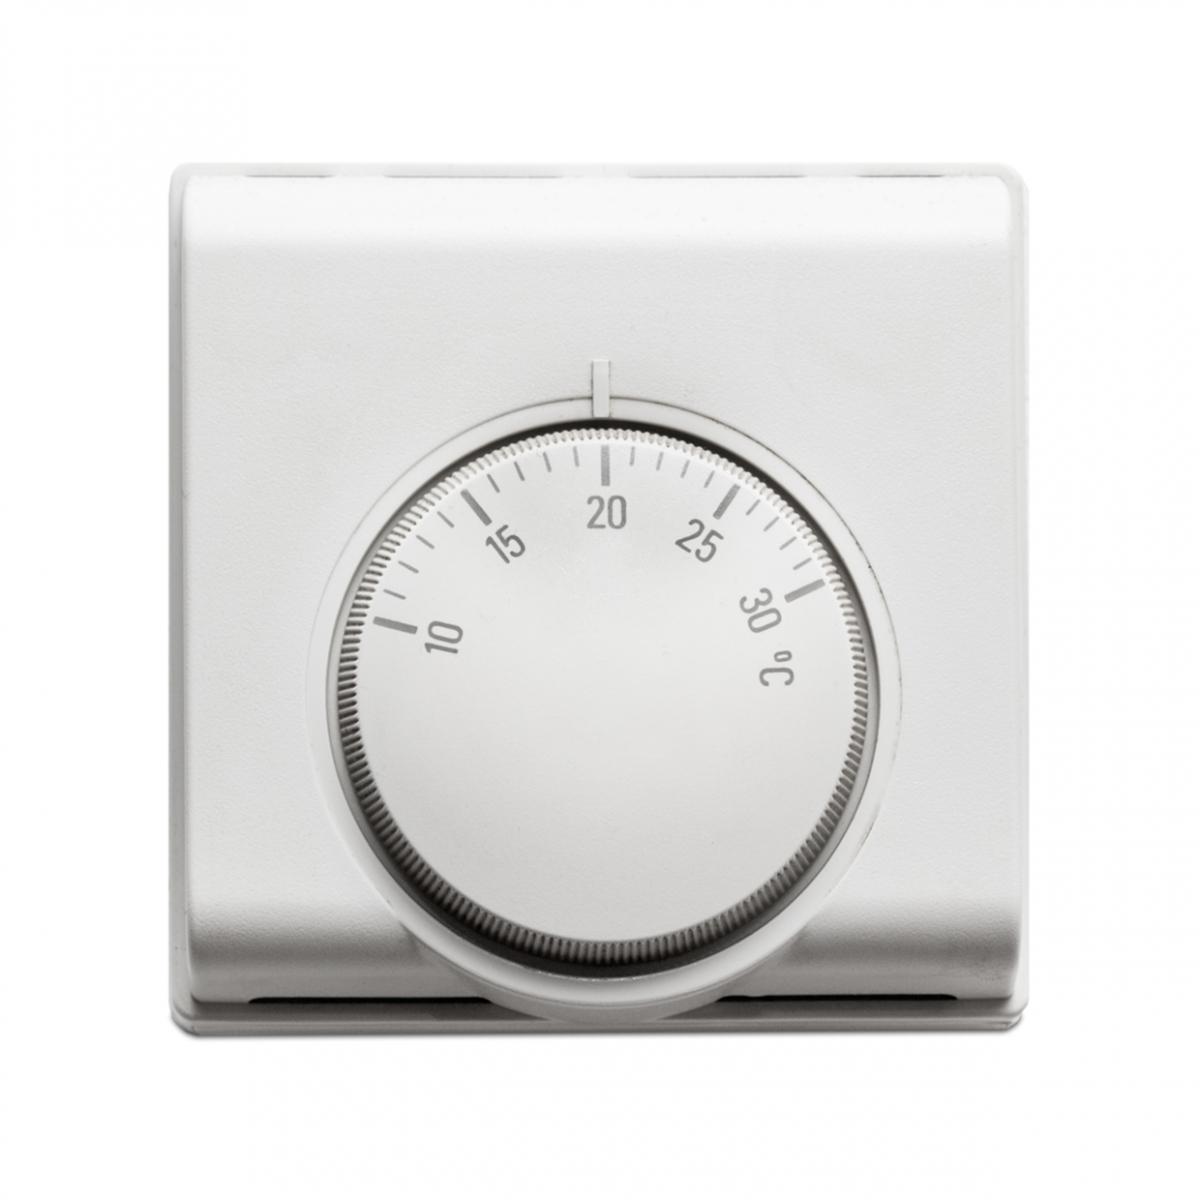 Imagen en la que se ve un termostato